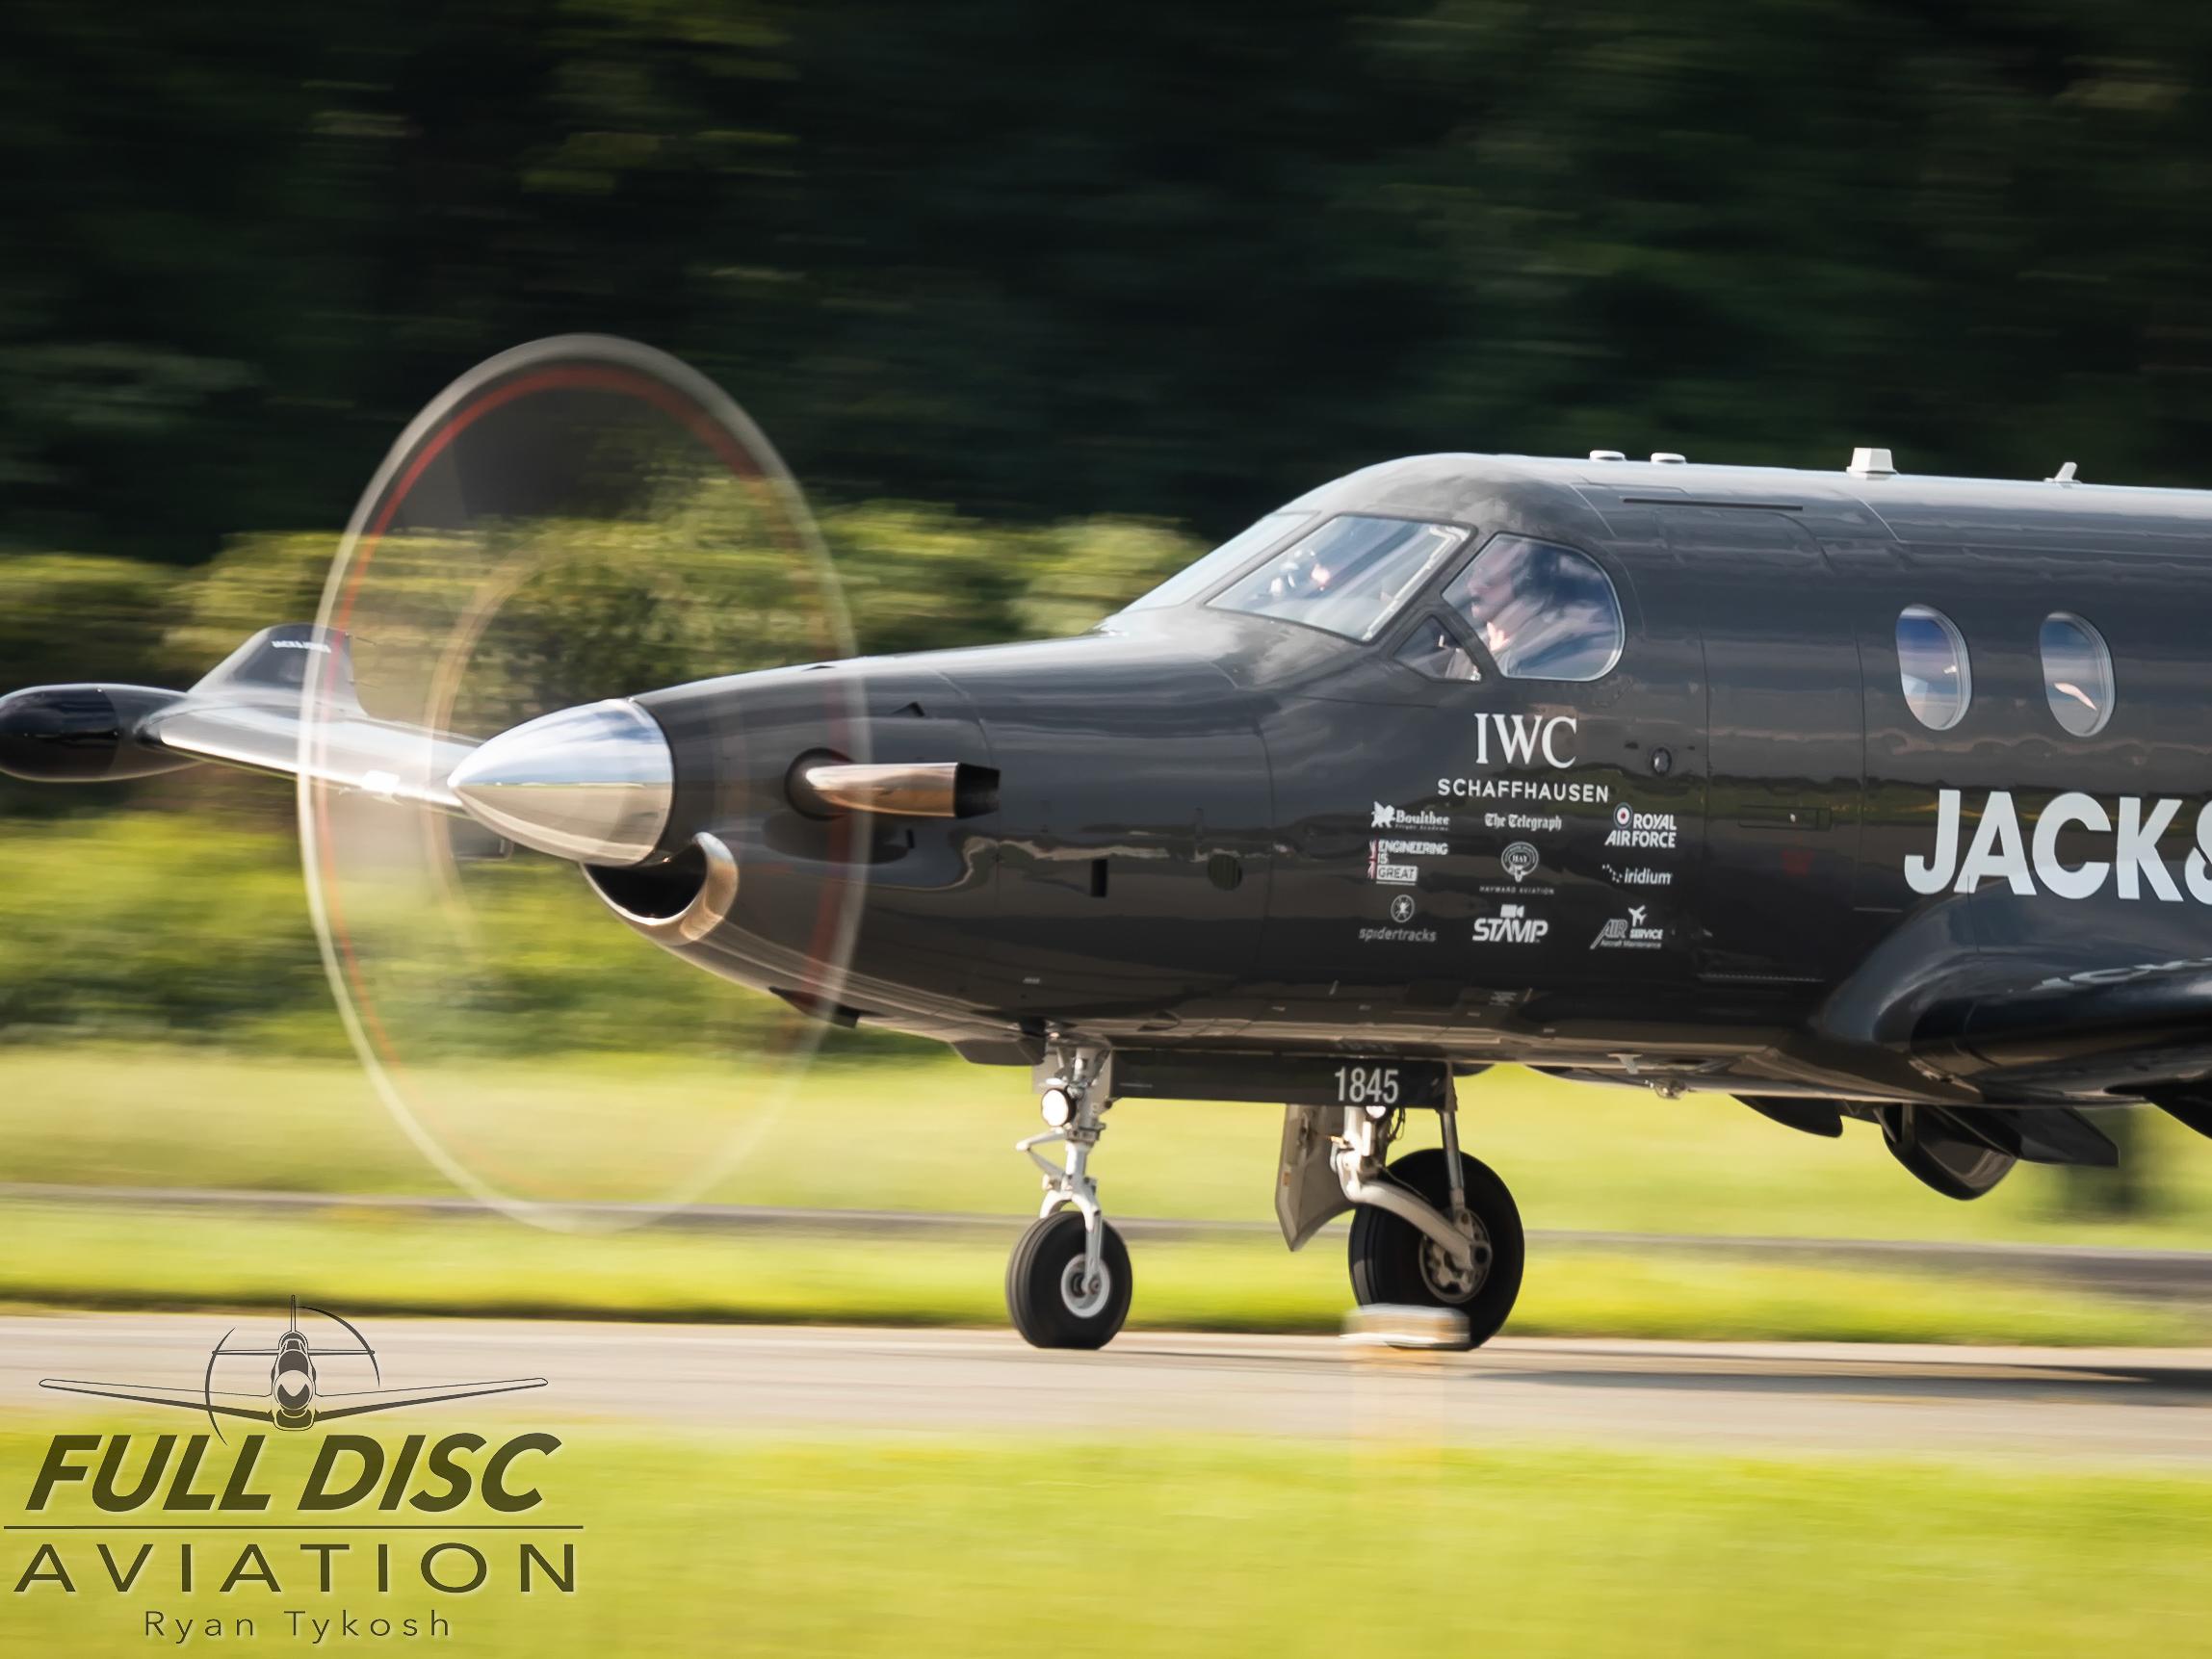 Silver Spitfire - Full Disc Aviation - Ryan Tykosh_August 21, 2019_05.jpg